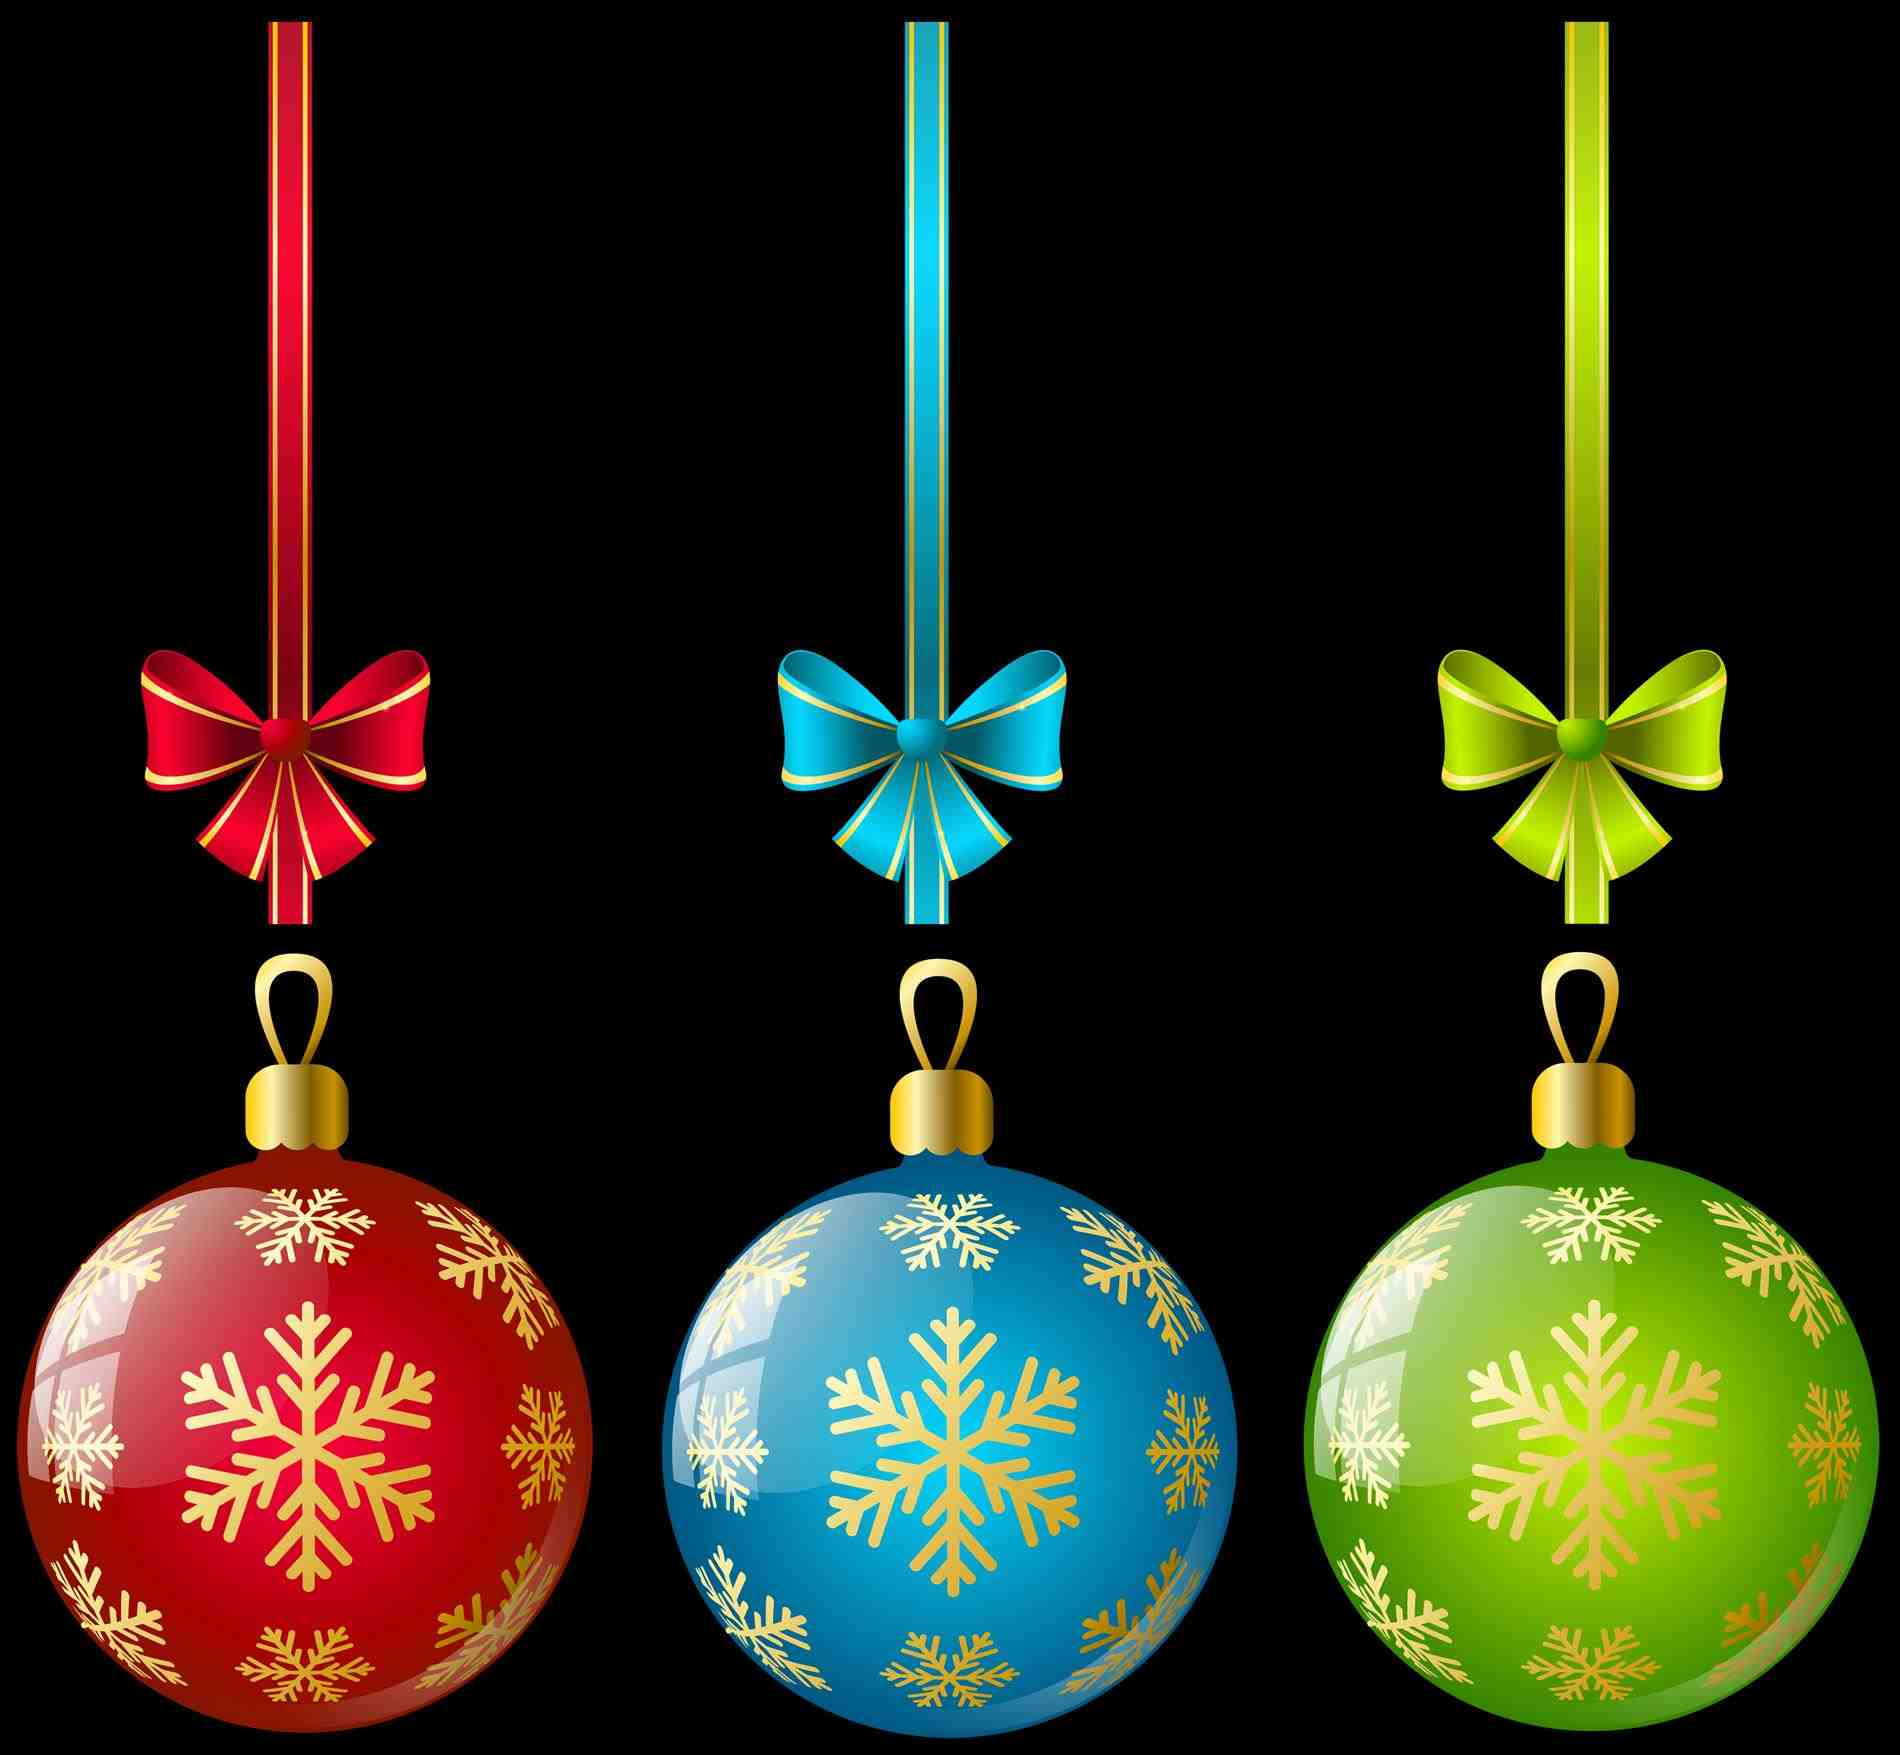 1900x1755 Christmas Ornament Clipart Free Cheminee.website